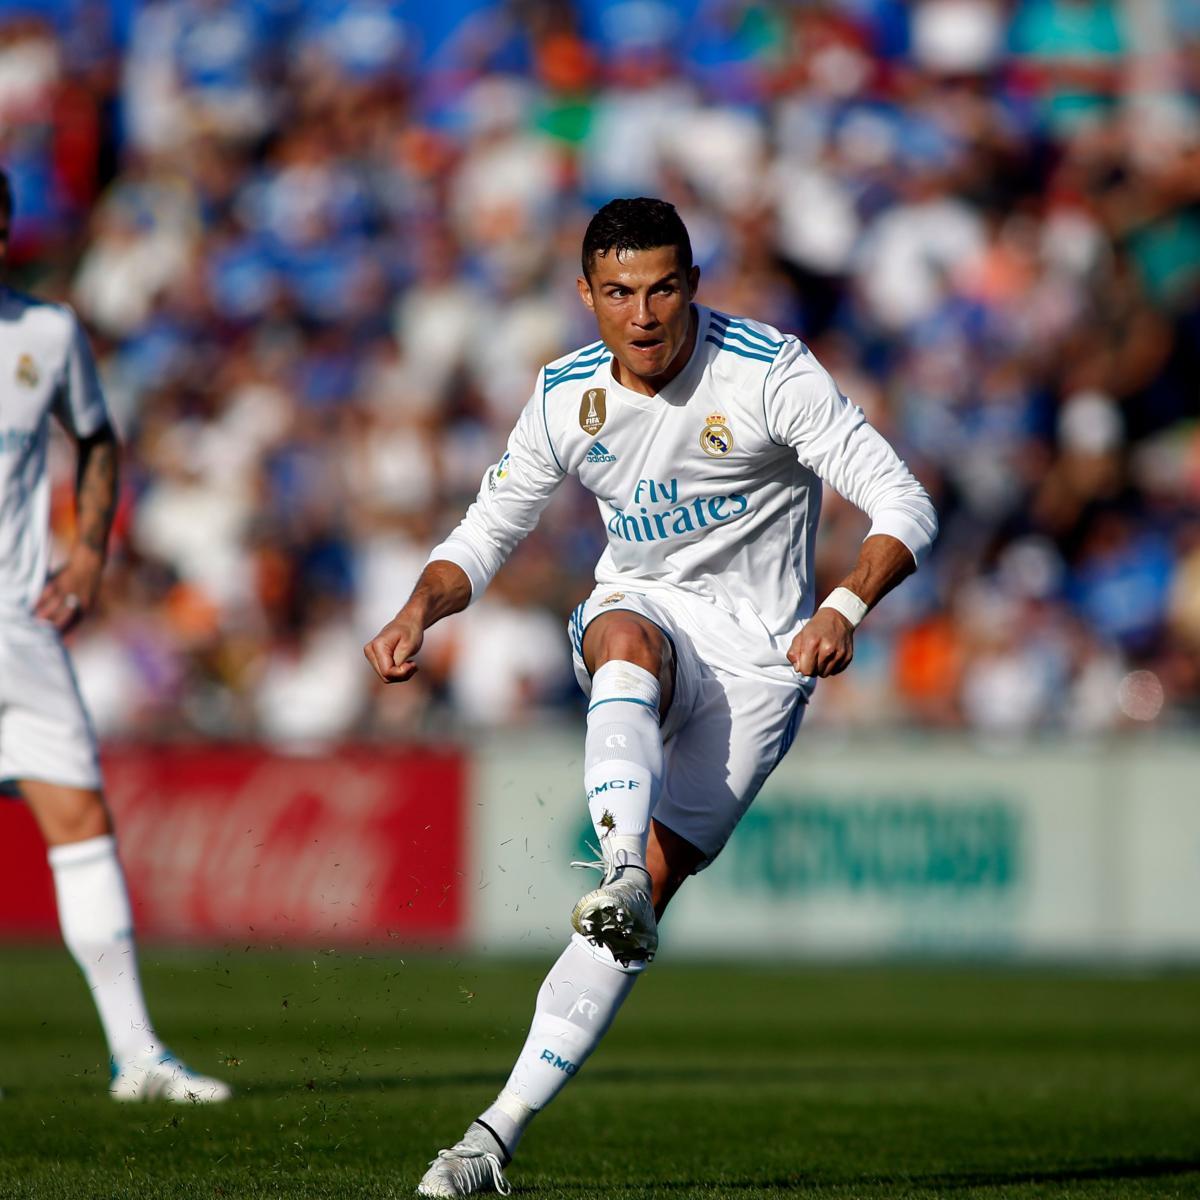 Cristiano Ronaldo S 4 Goals Lead Real Madrid To Win Vs: Cristiano Ronaldo's Late Goal Secures Win For Real Madrid